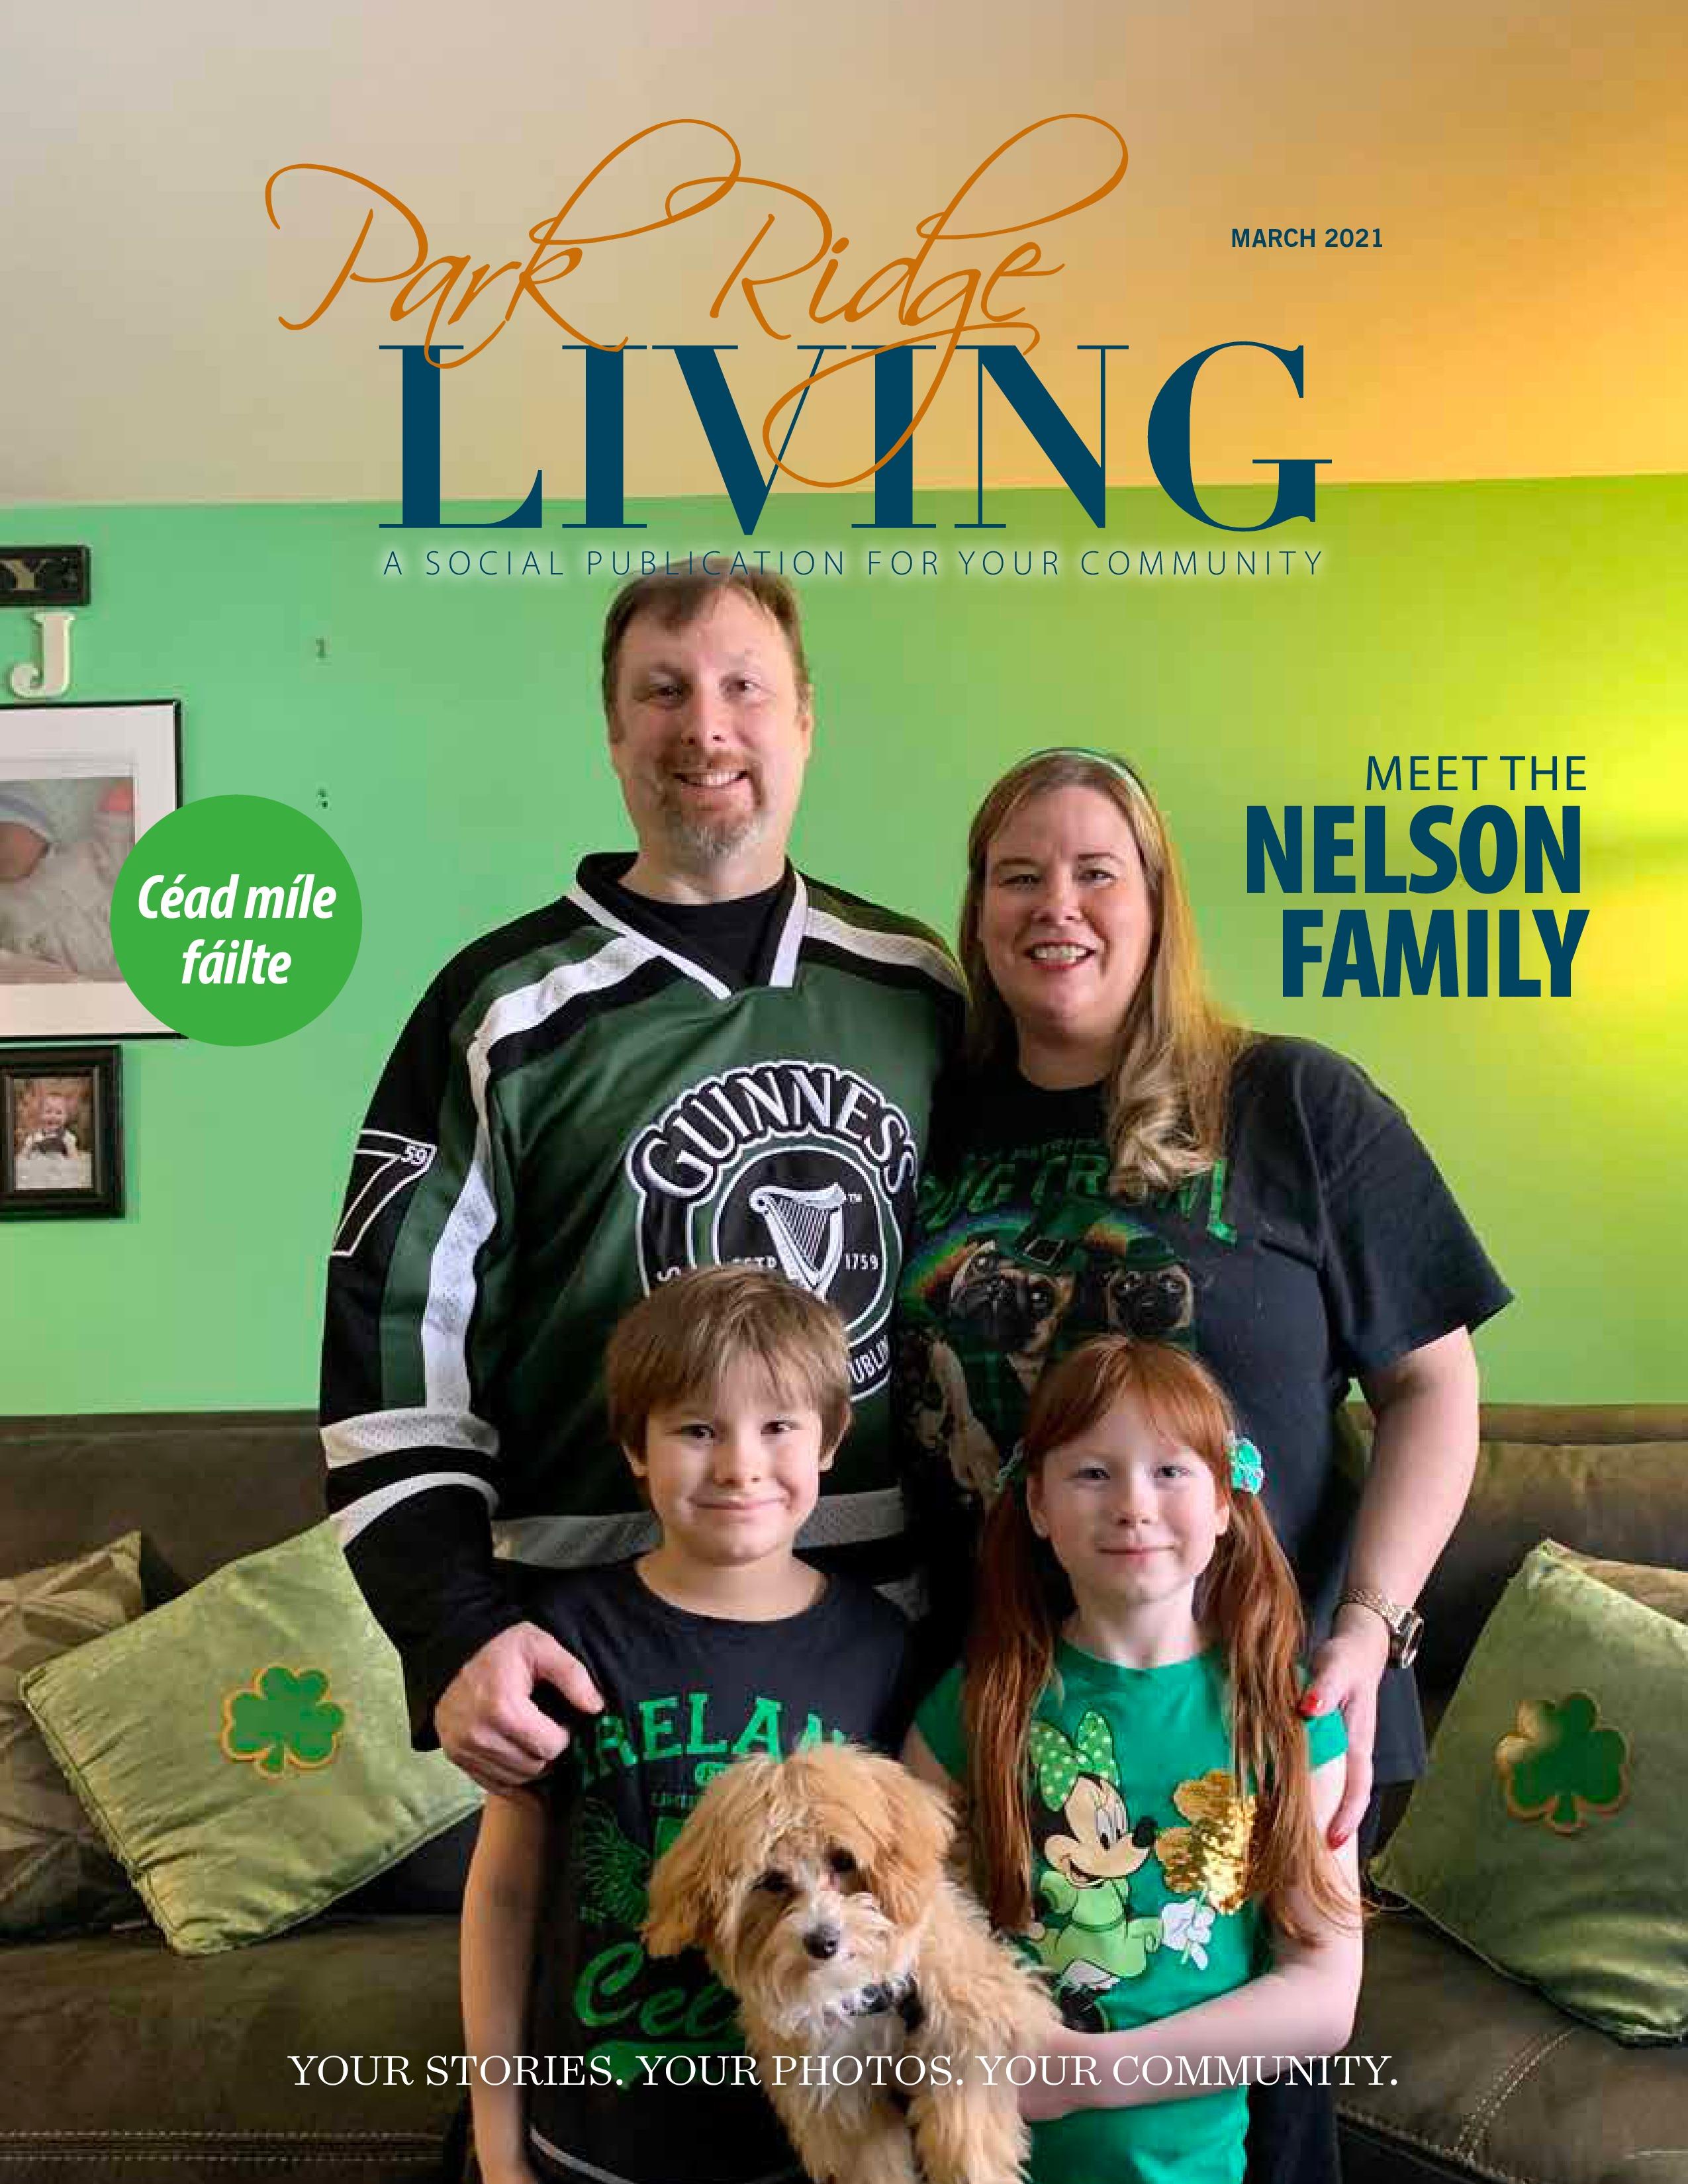 Park Ridge Living 2021-03-01